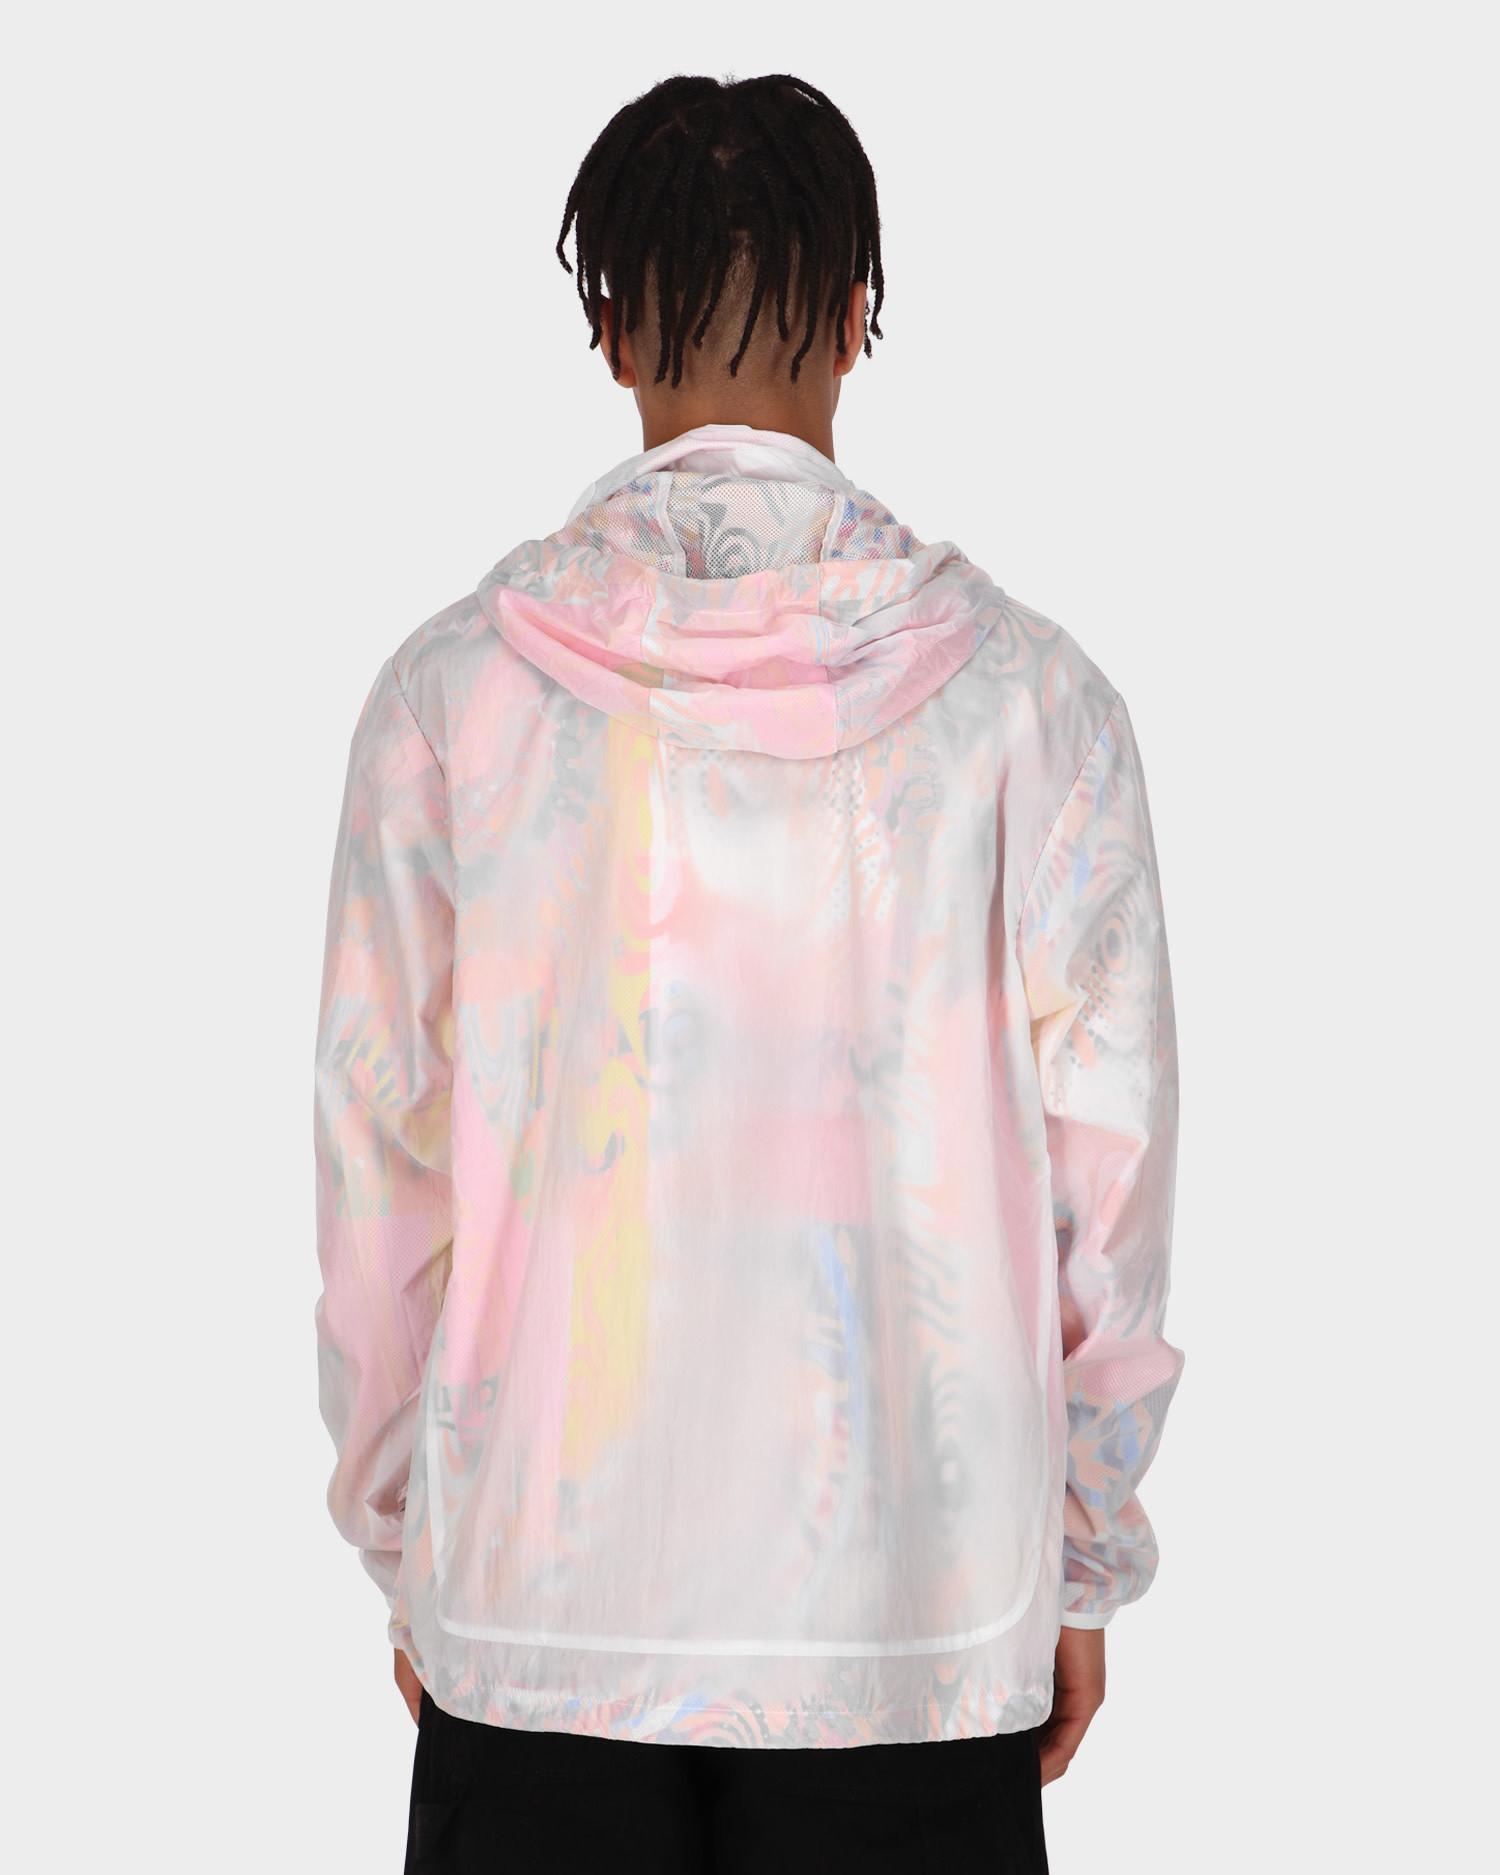 Nike SB x Killing The Floor Jacket White